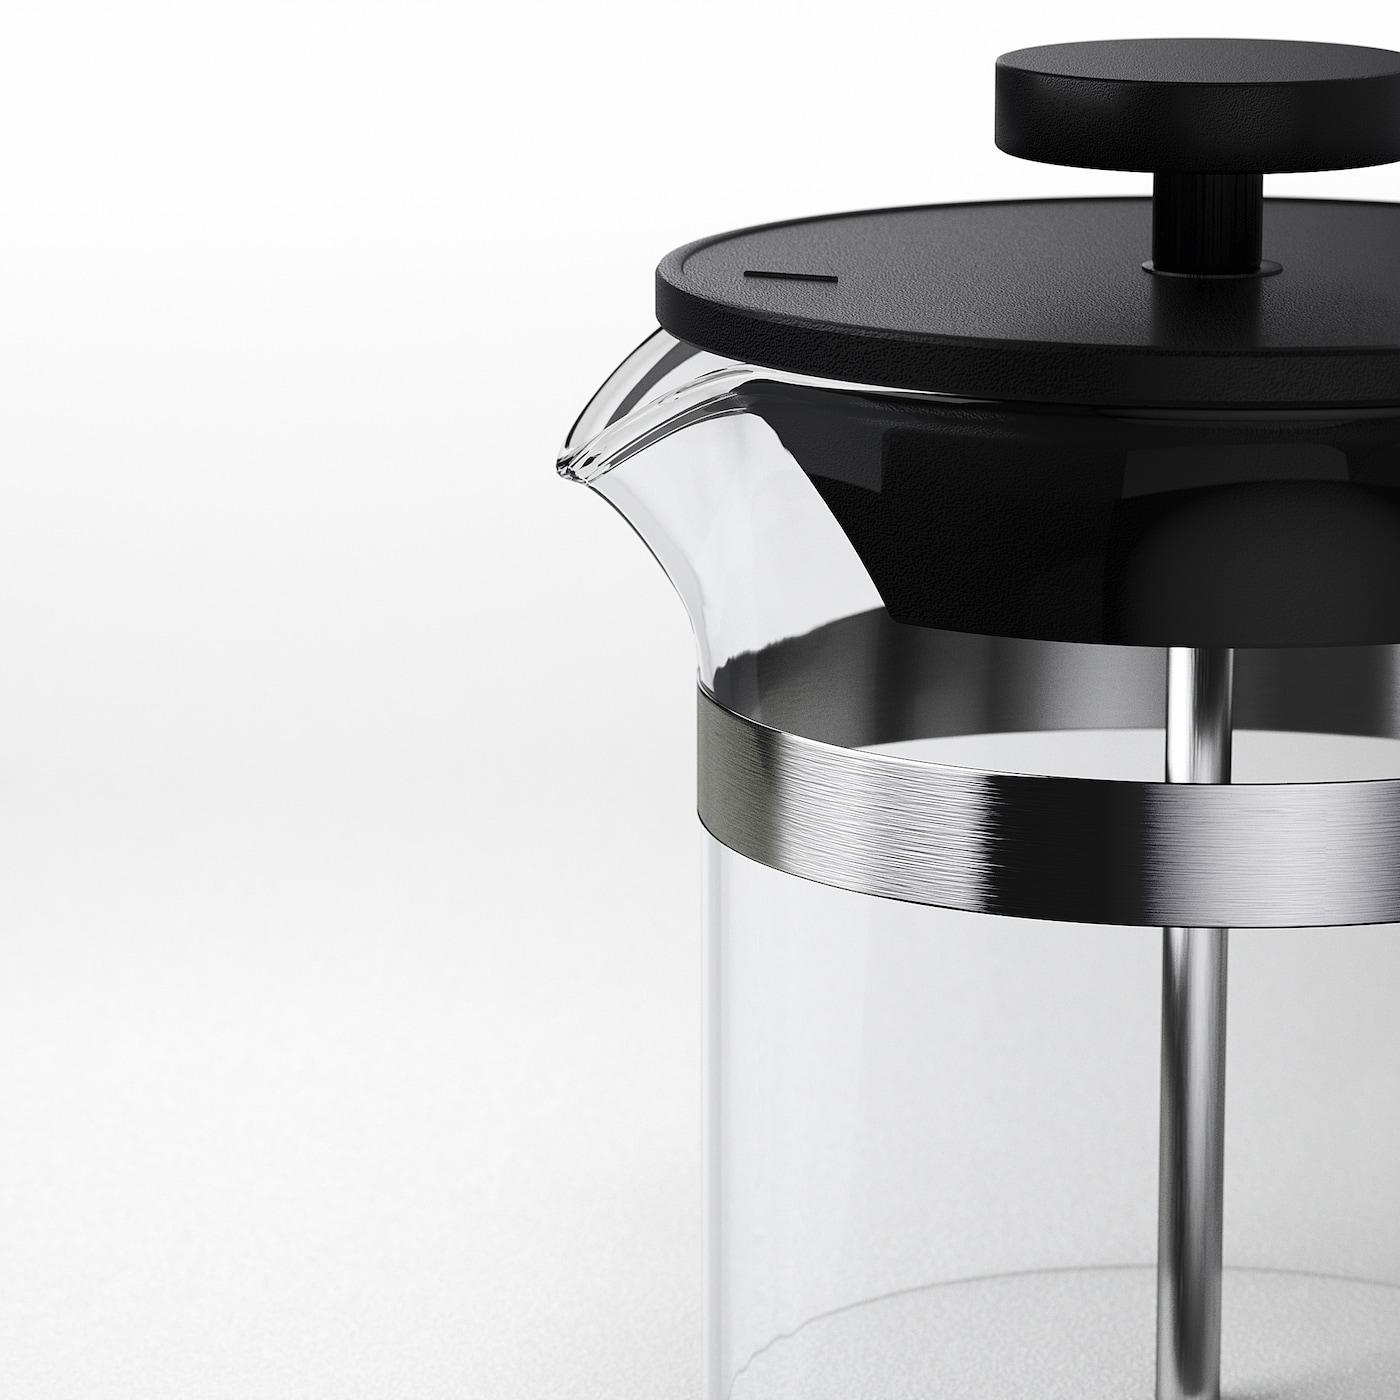 UPPHETTA Kaffee-/Teezubereiter, Glas/Edelstahl, 0.4 l